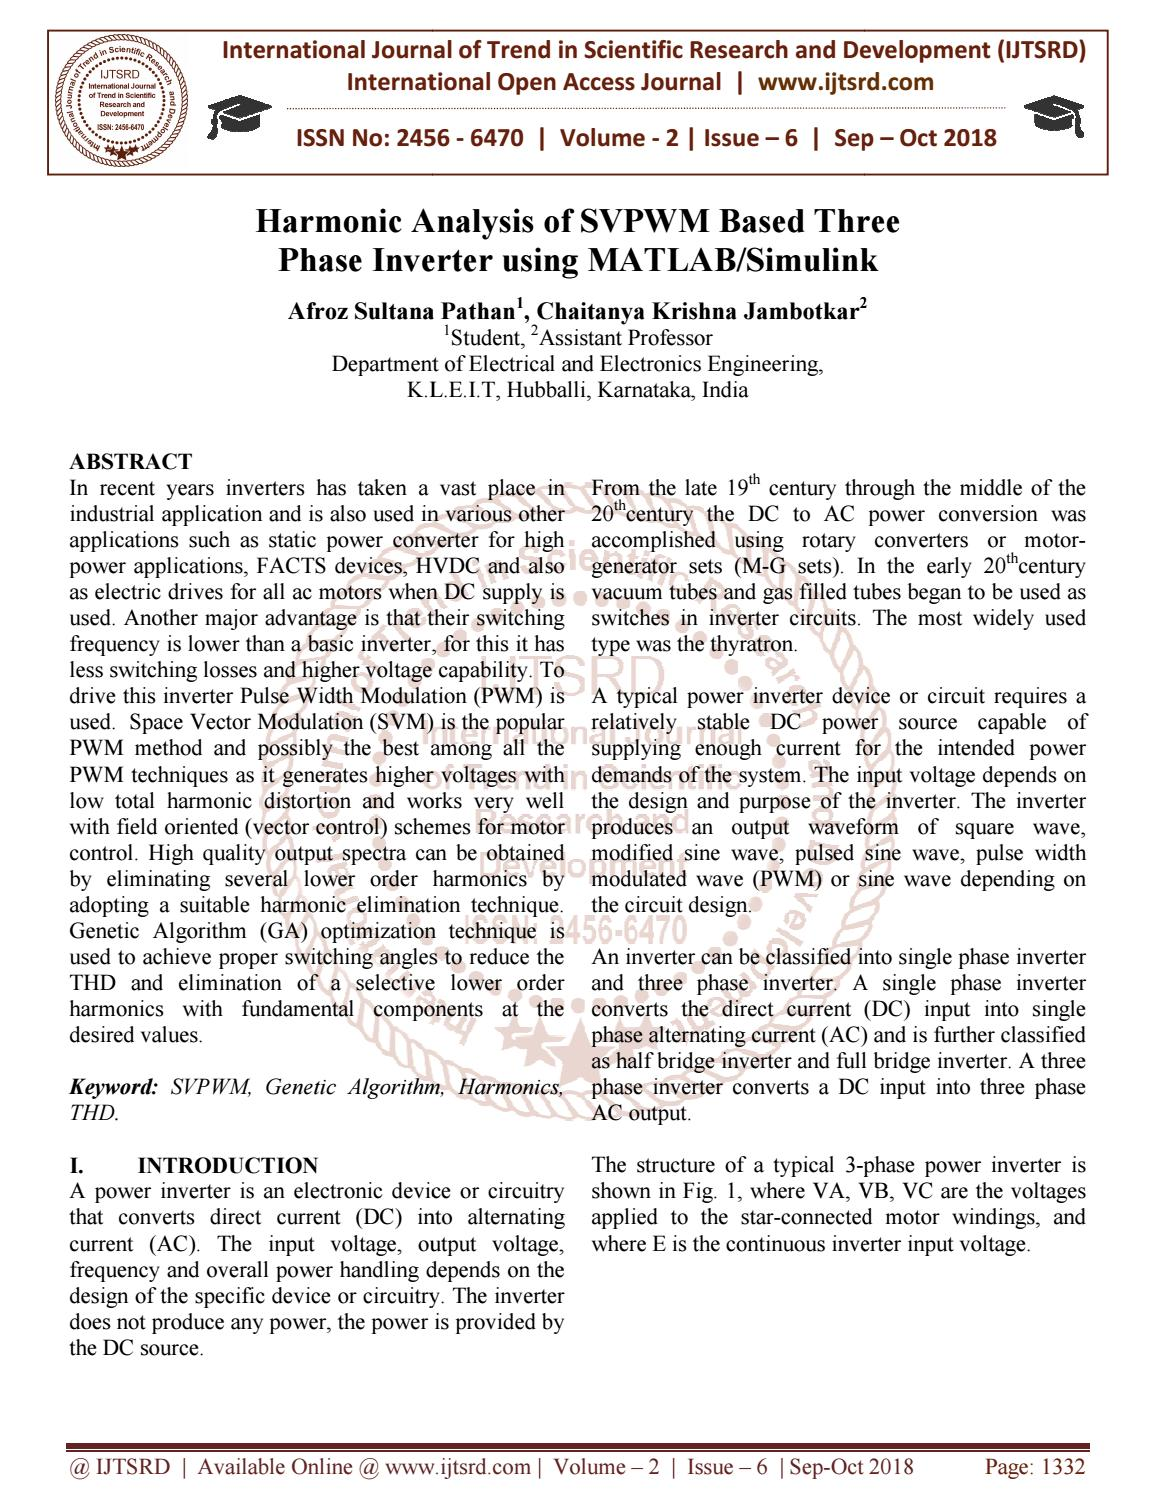 Harmonic Analysis of SVPWM Based Three Phase Inverter using MATLAB